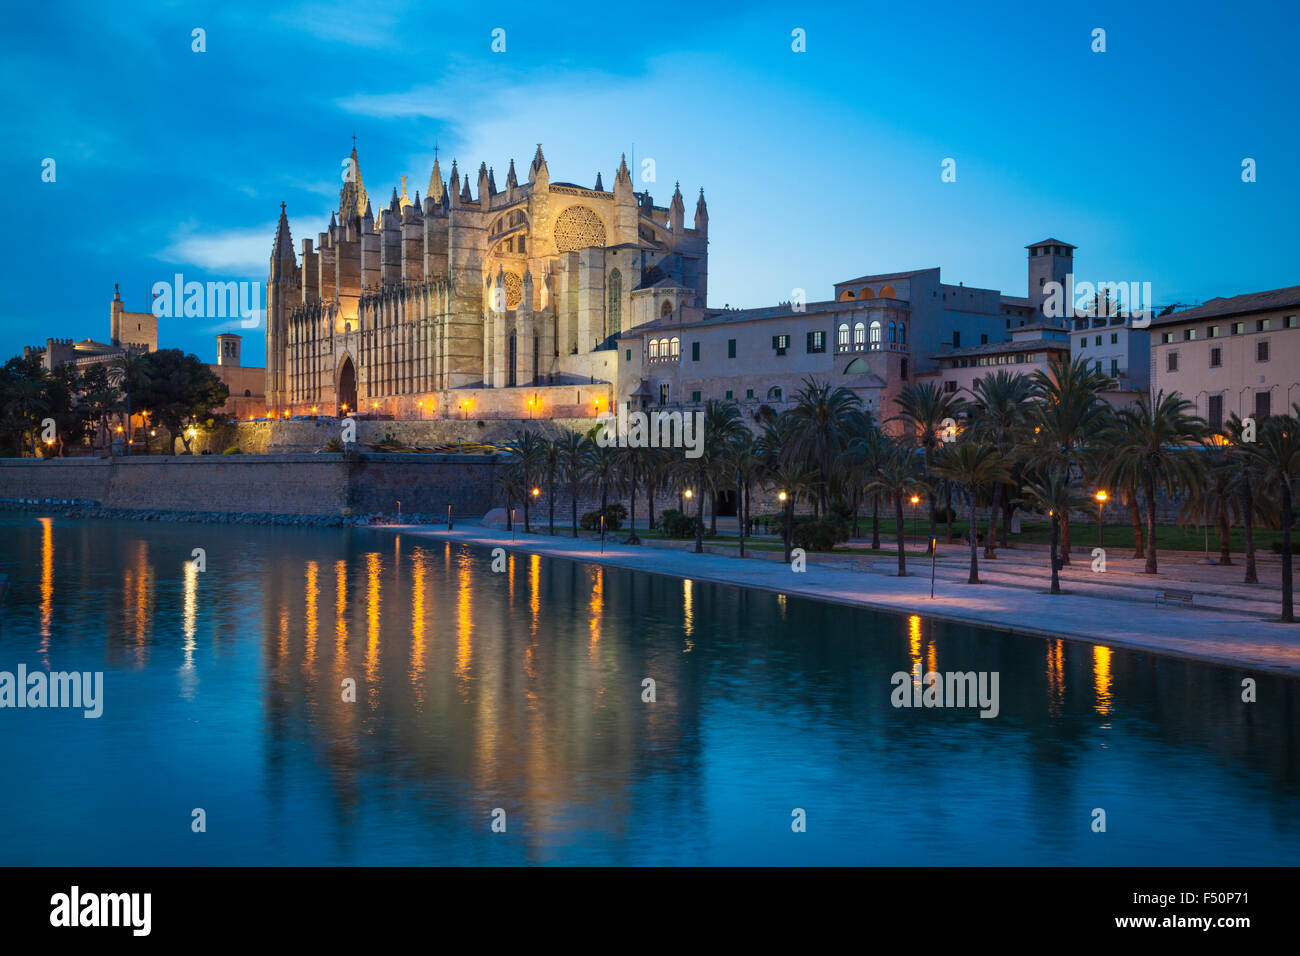 Cathedral San Seu in Palma de Mallorca by night - Stock Image